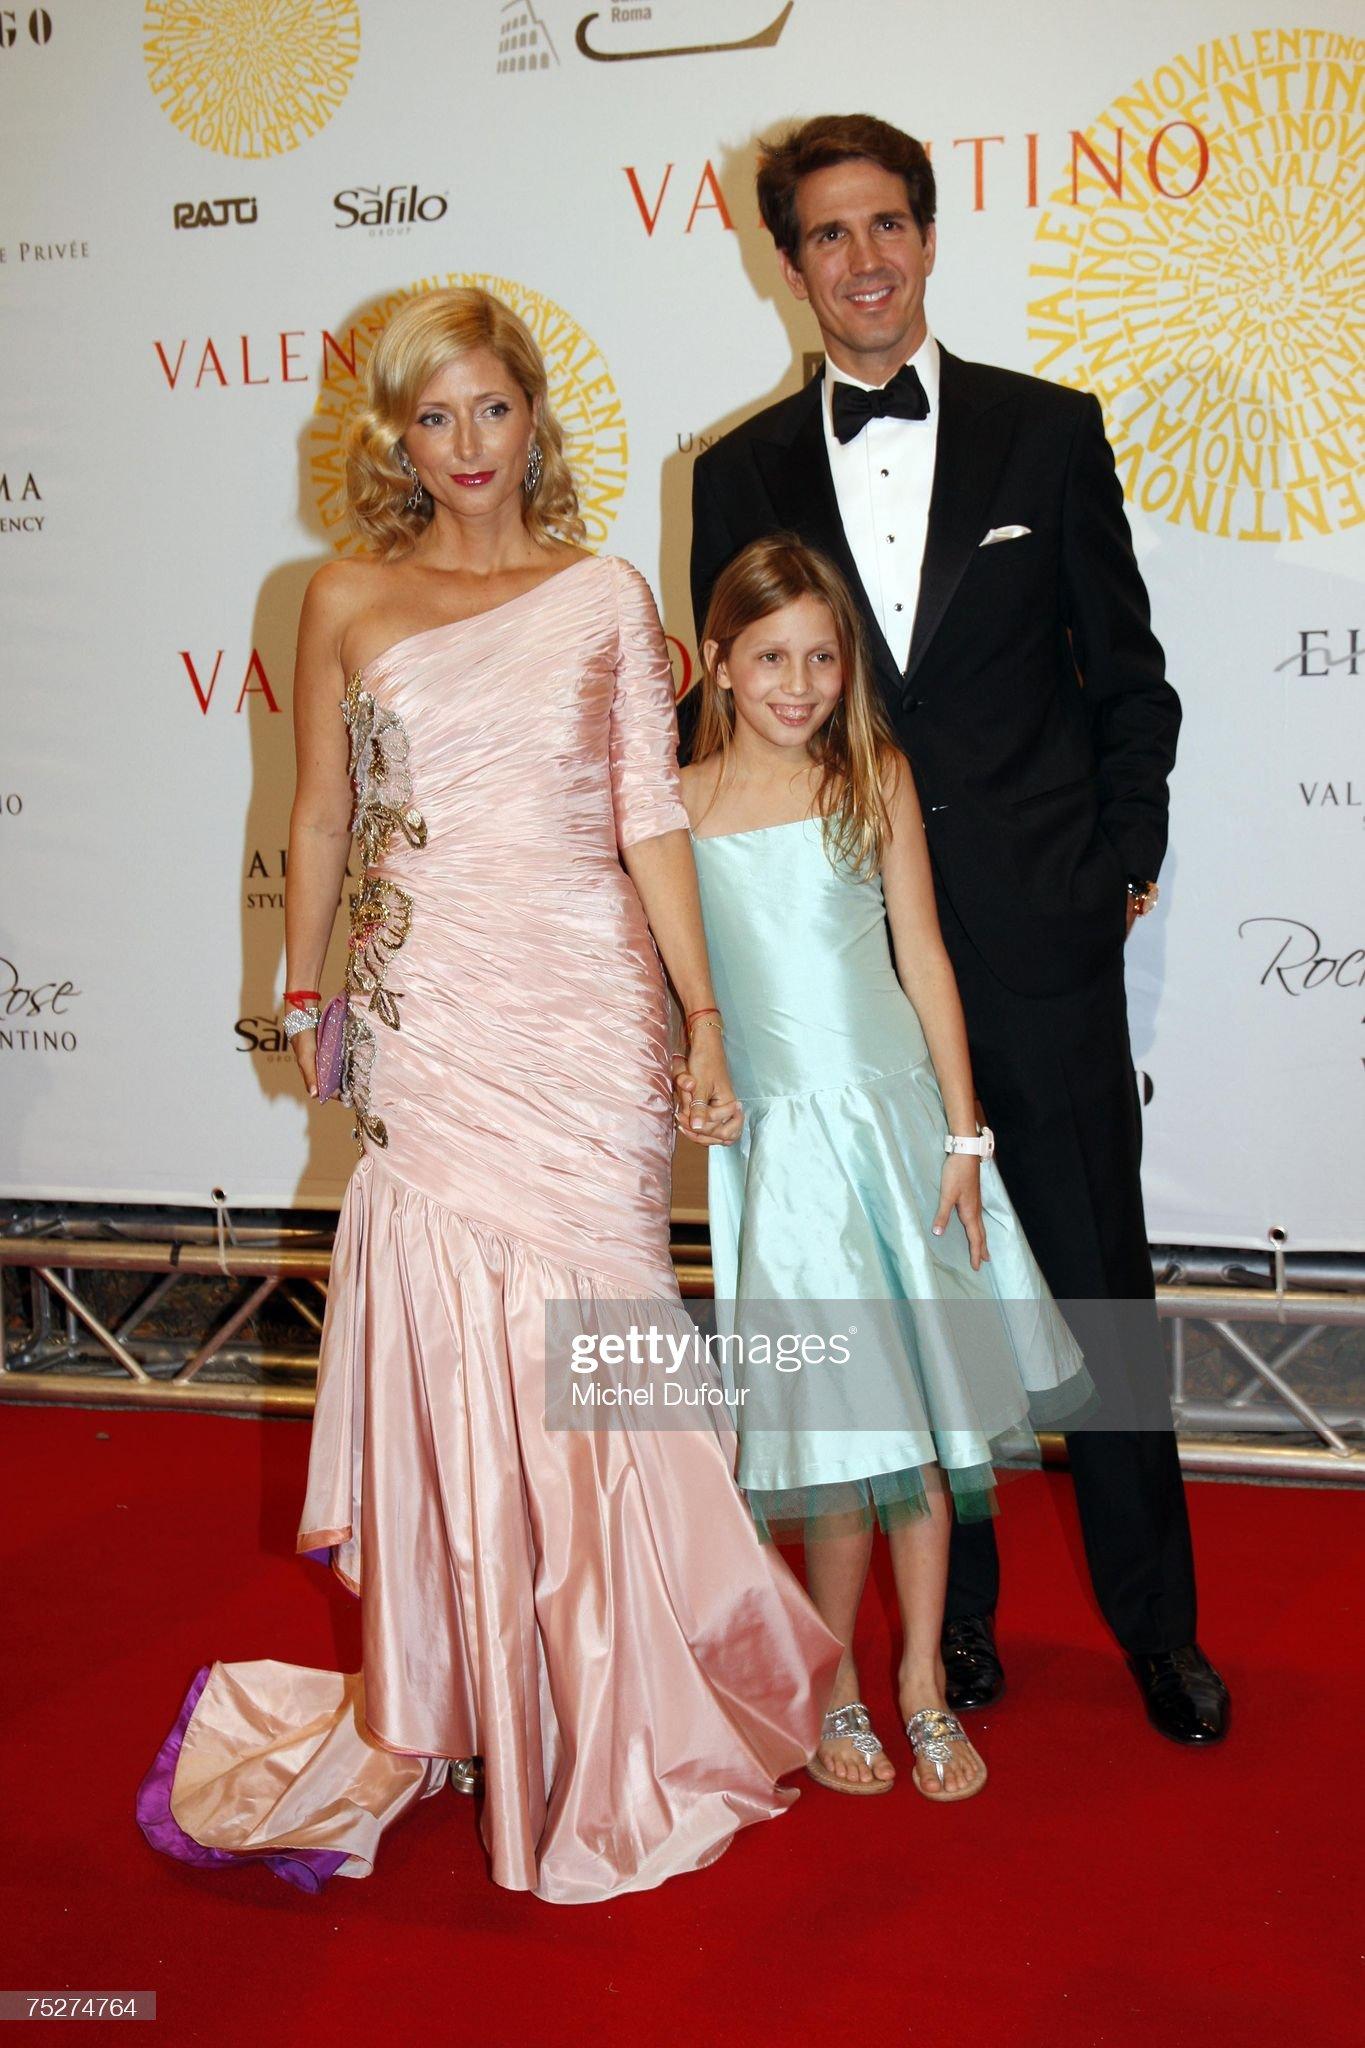 Valentino 45th Anniversary Celebration - Gala Arrivals : News Photo